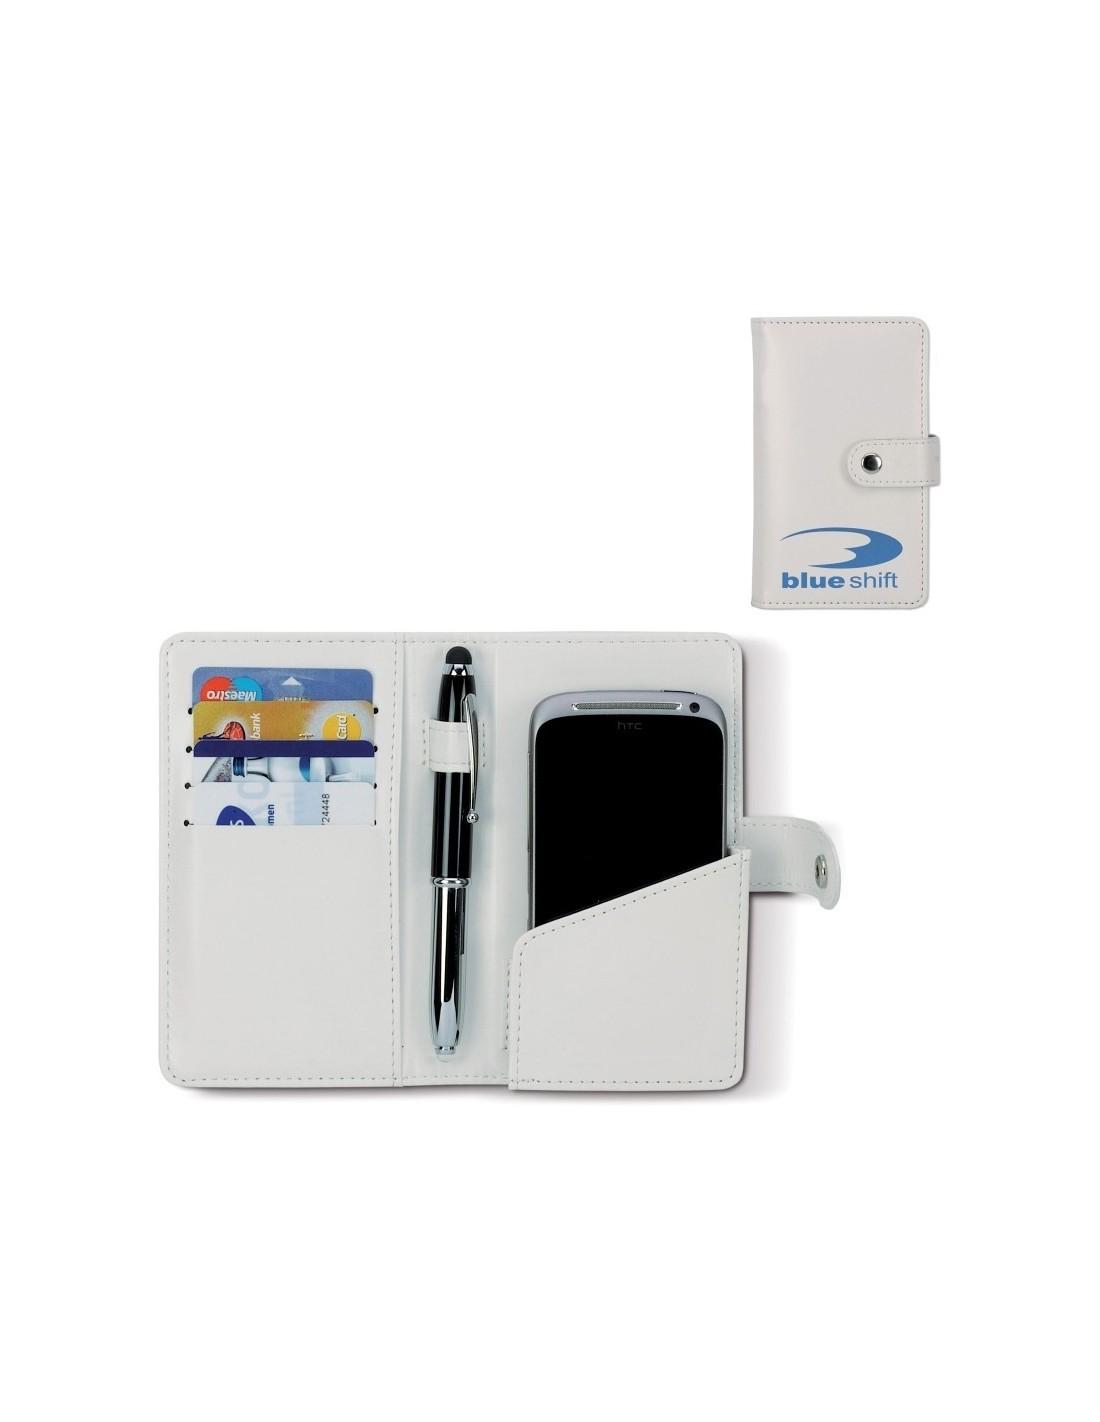 e63fd799e5543 Pokrowiec na smartfona z miejscem na karty z własnym nadrukiem